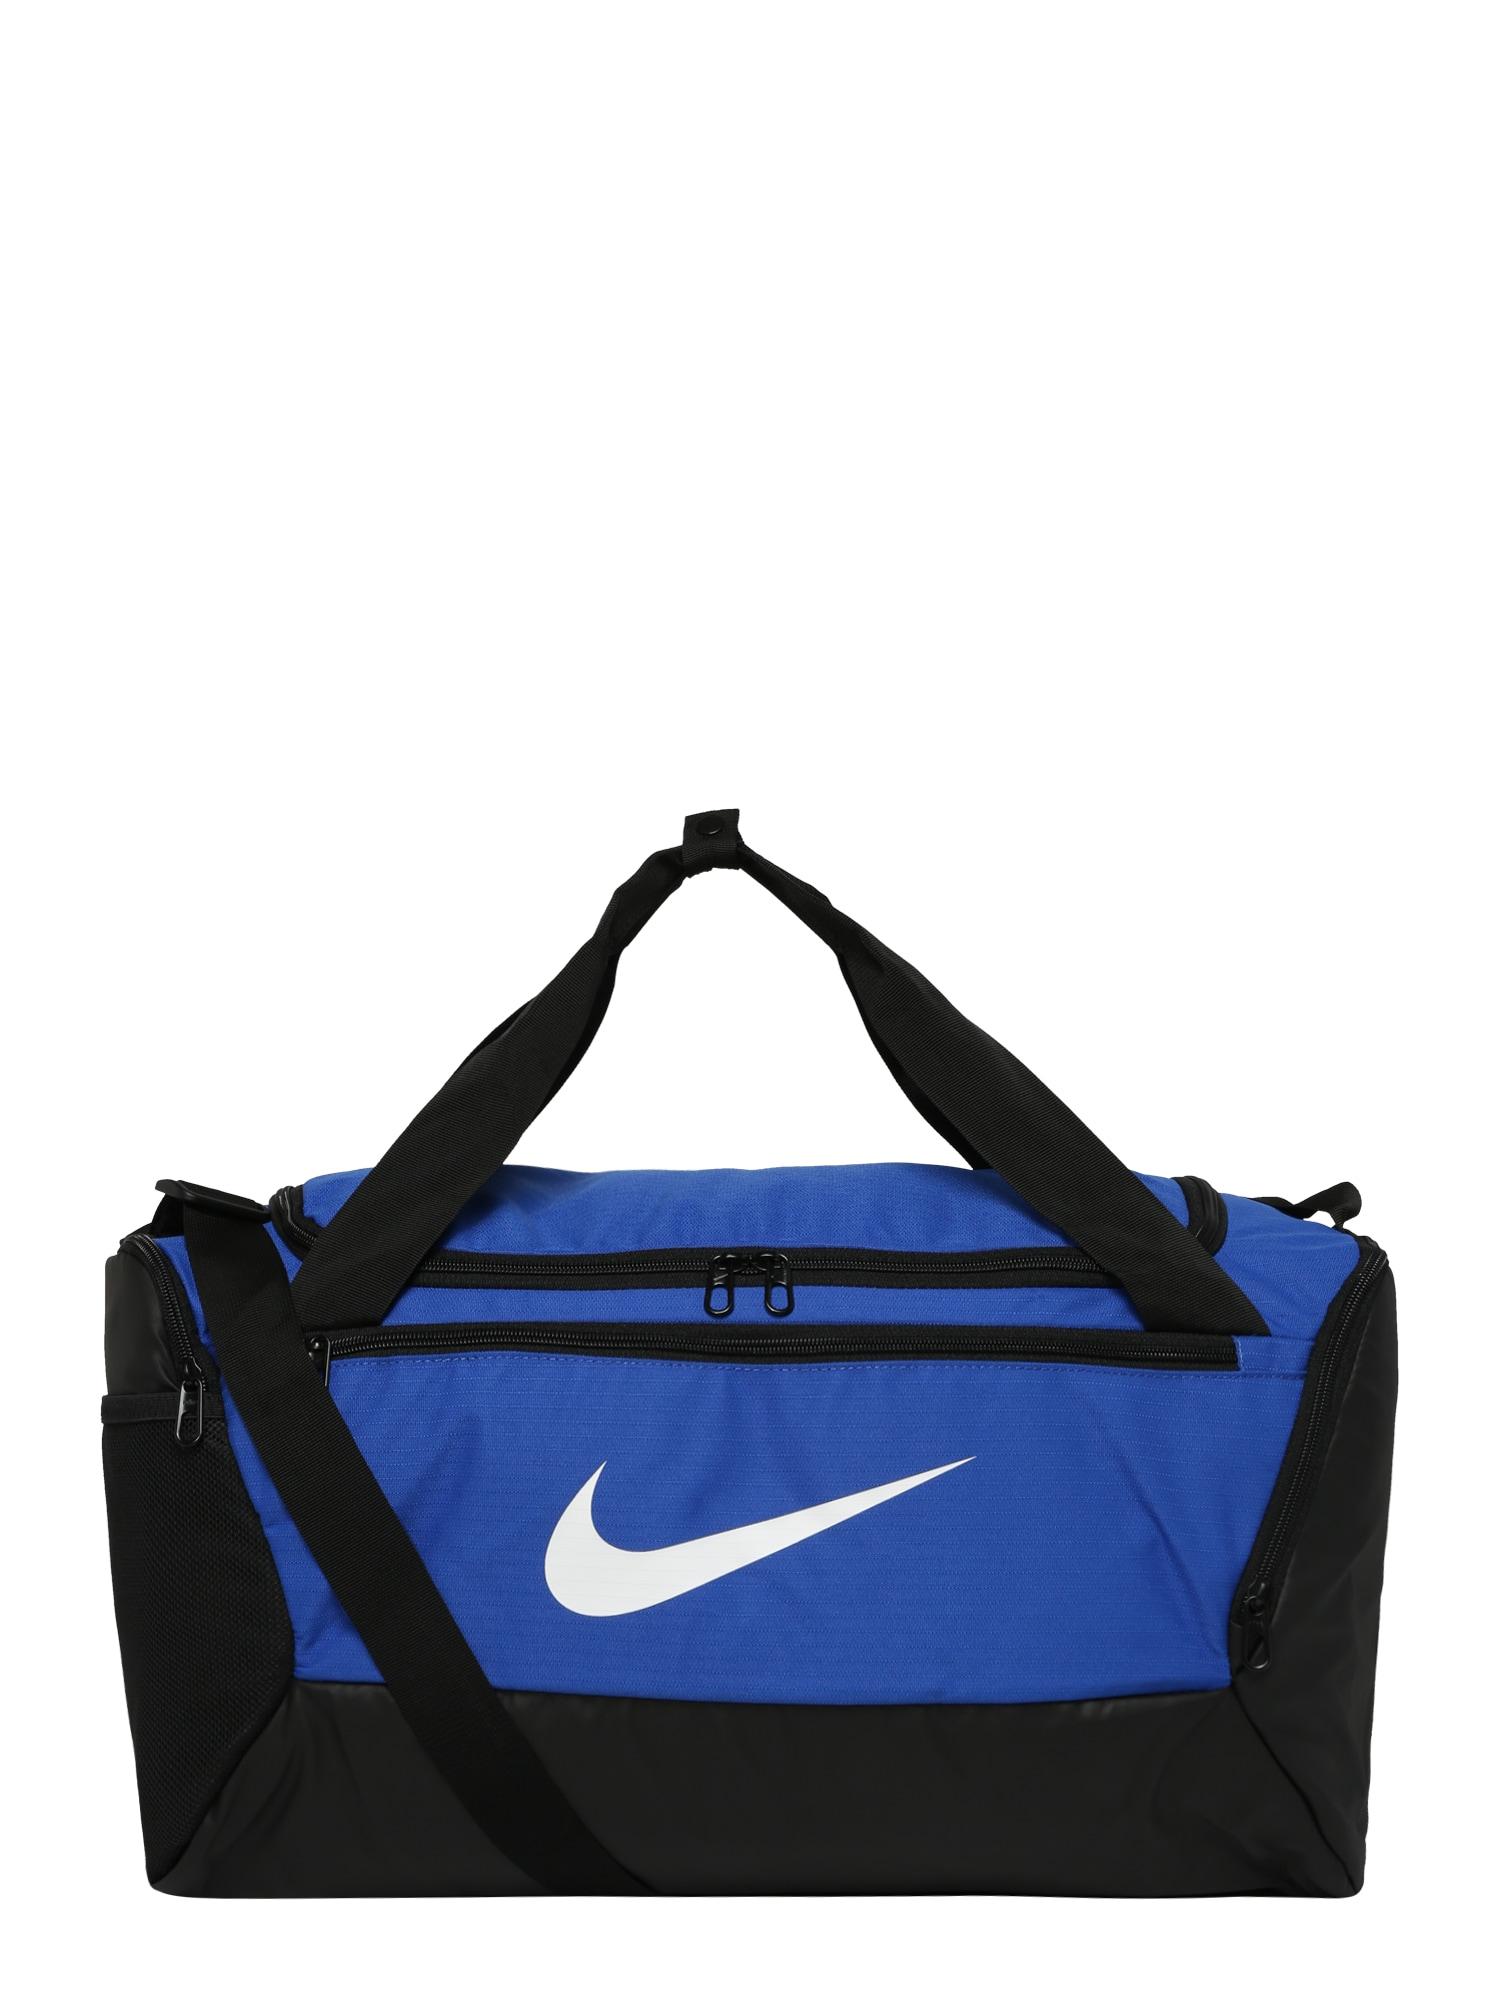 NIKE Sportinis krepšys mėlyna / juoda / balta